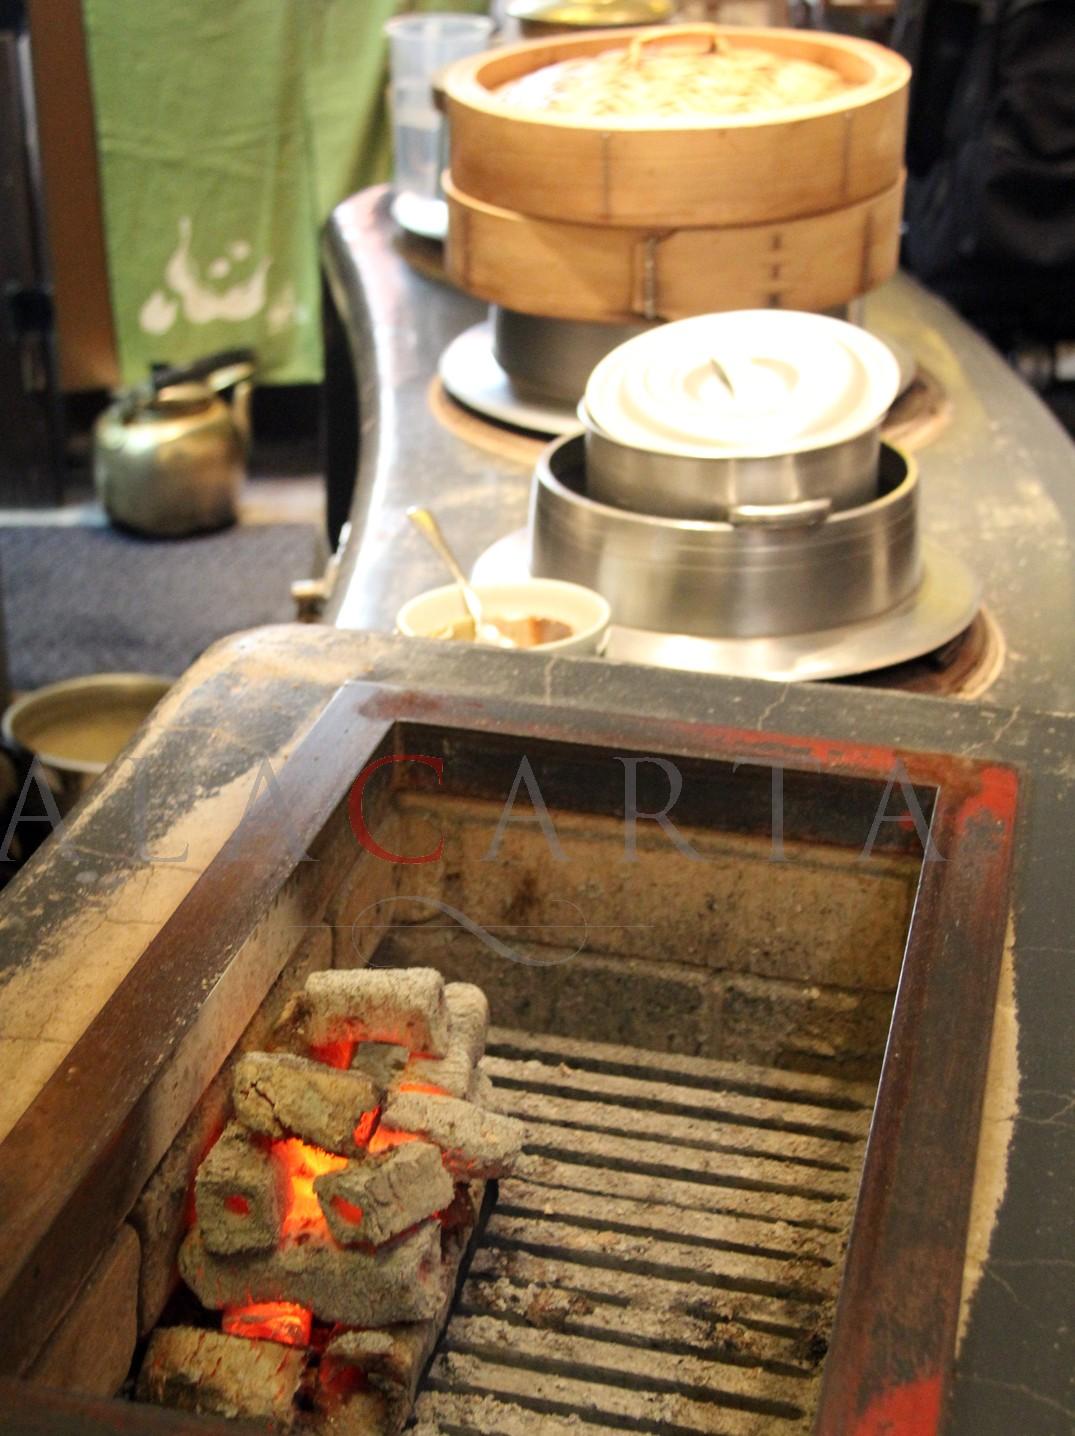 Kitao cucina, brace e vapore